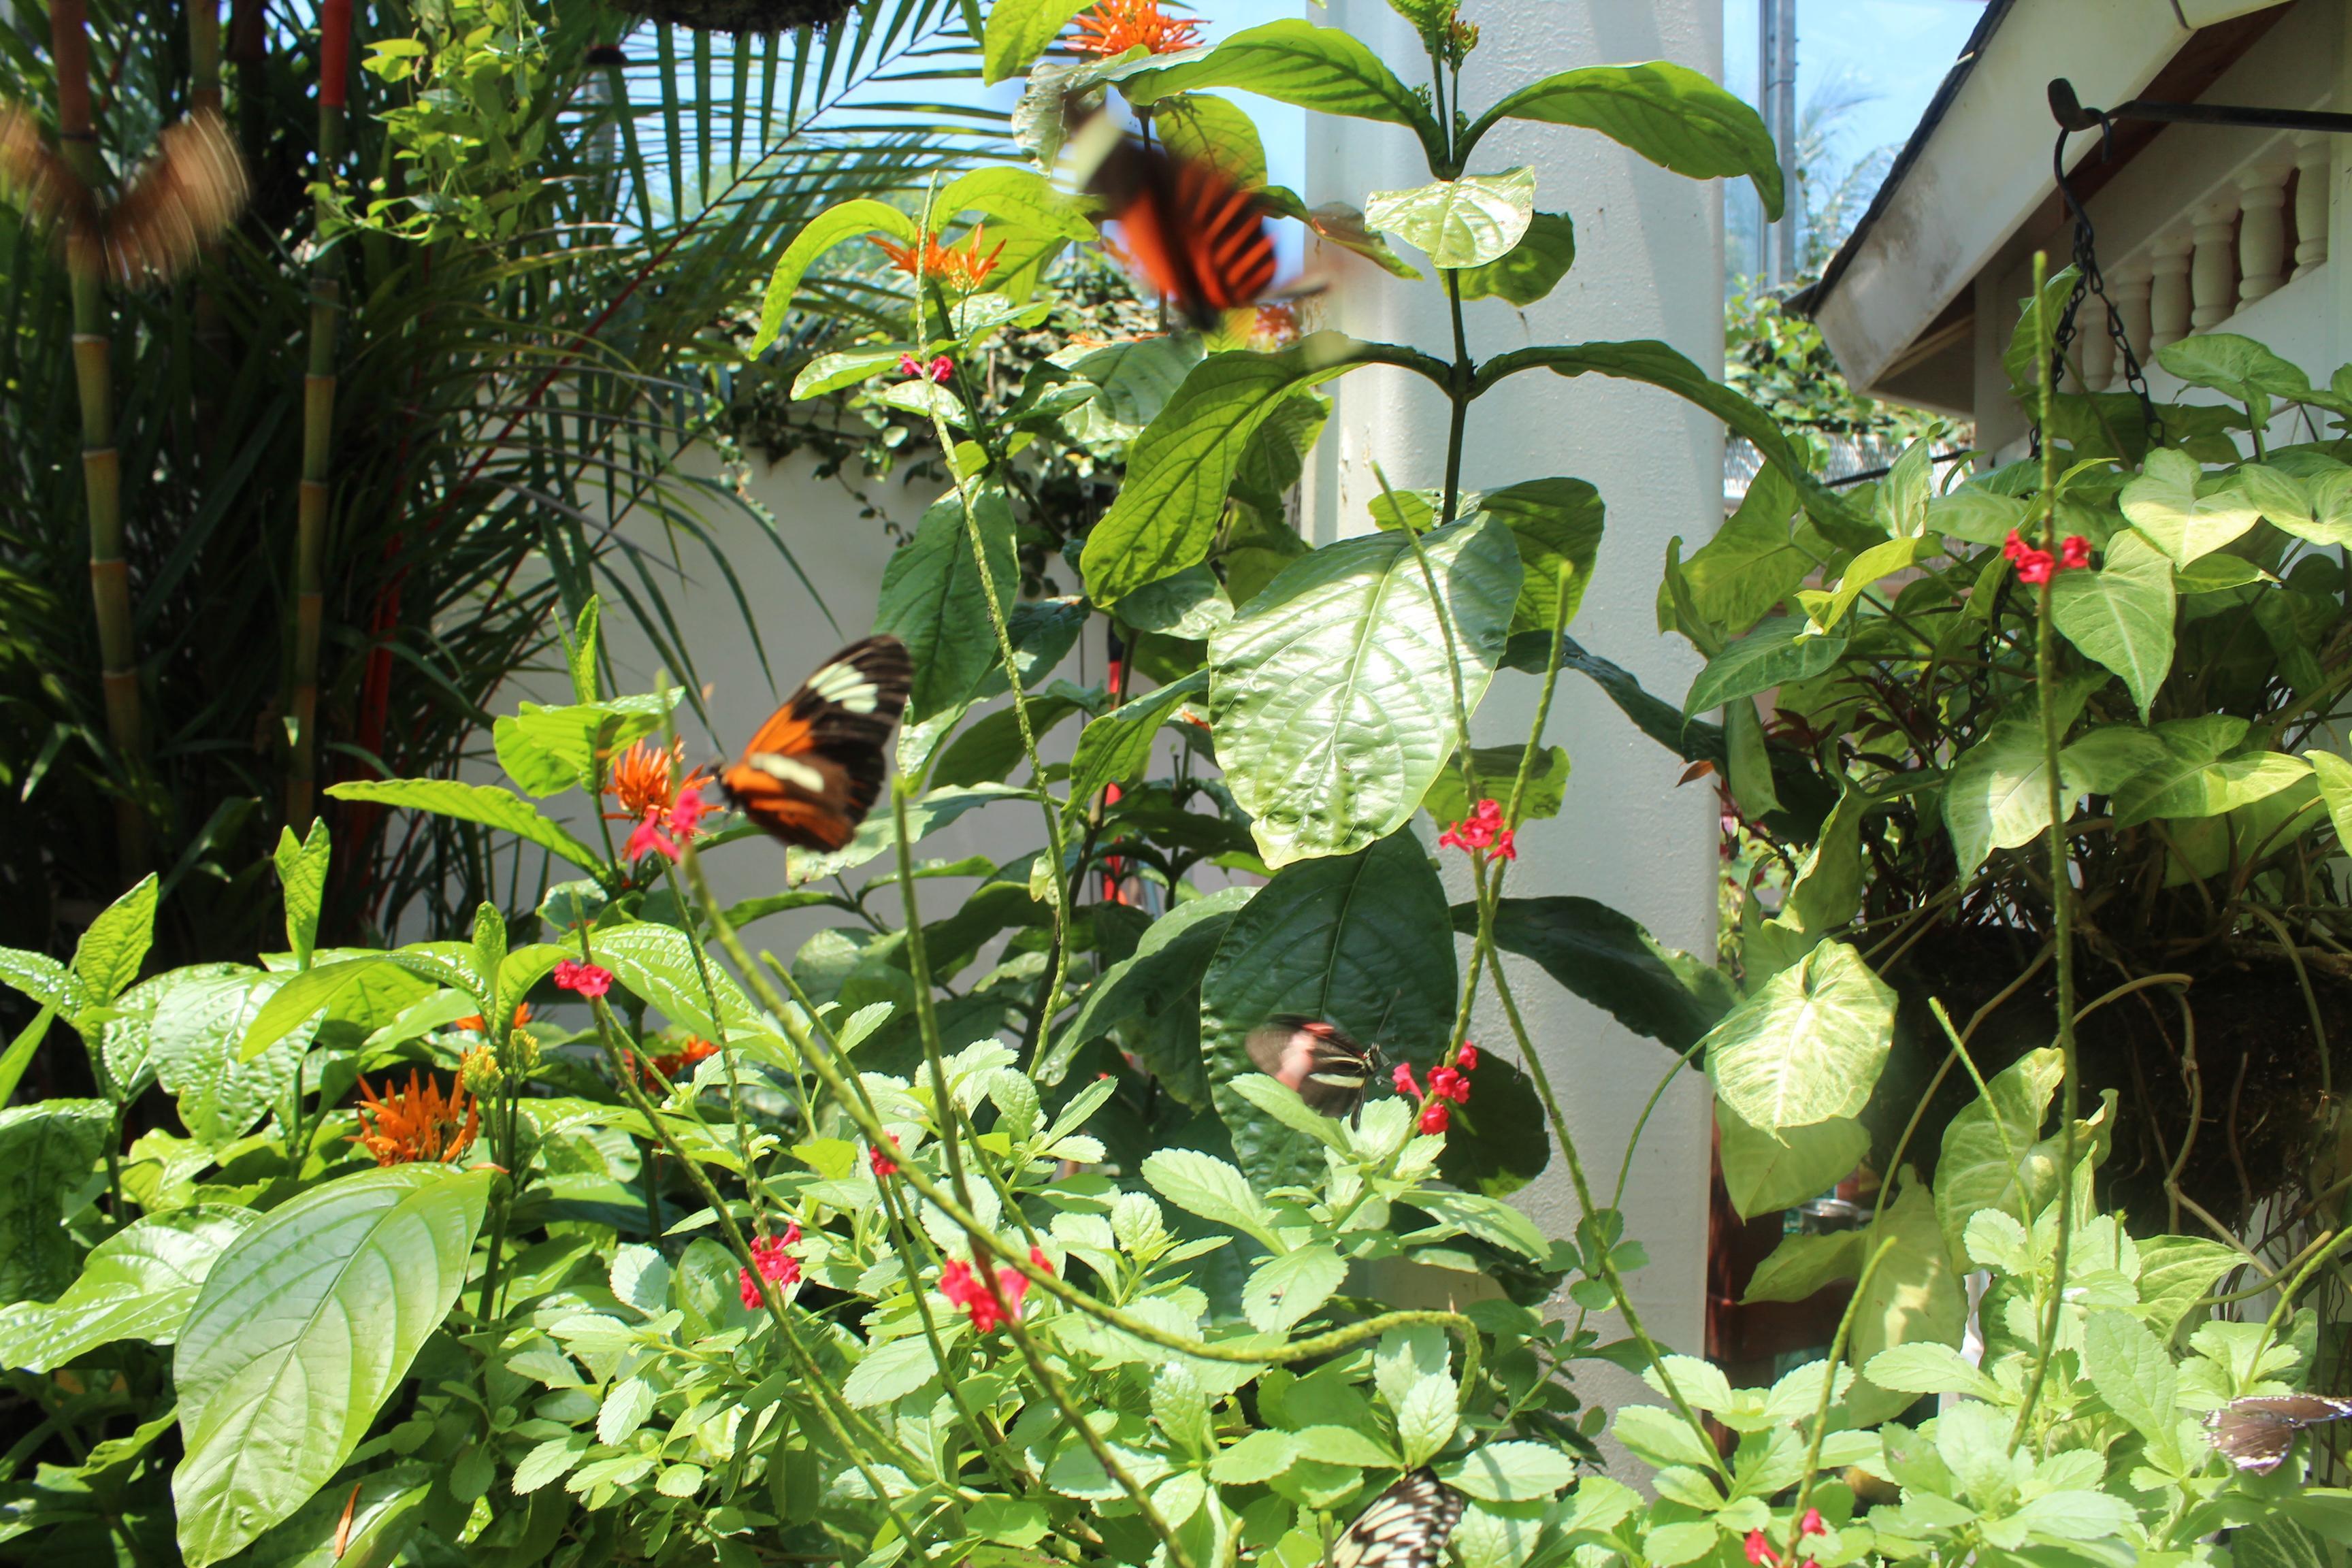 kw-butterfly-foliage-4